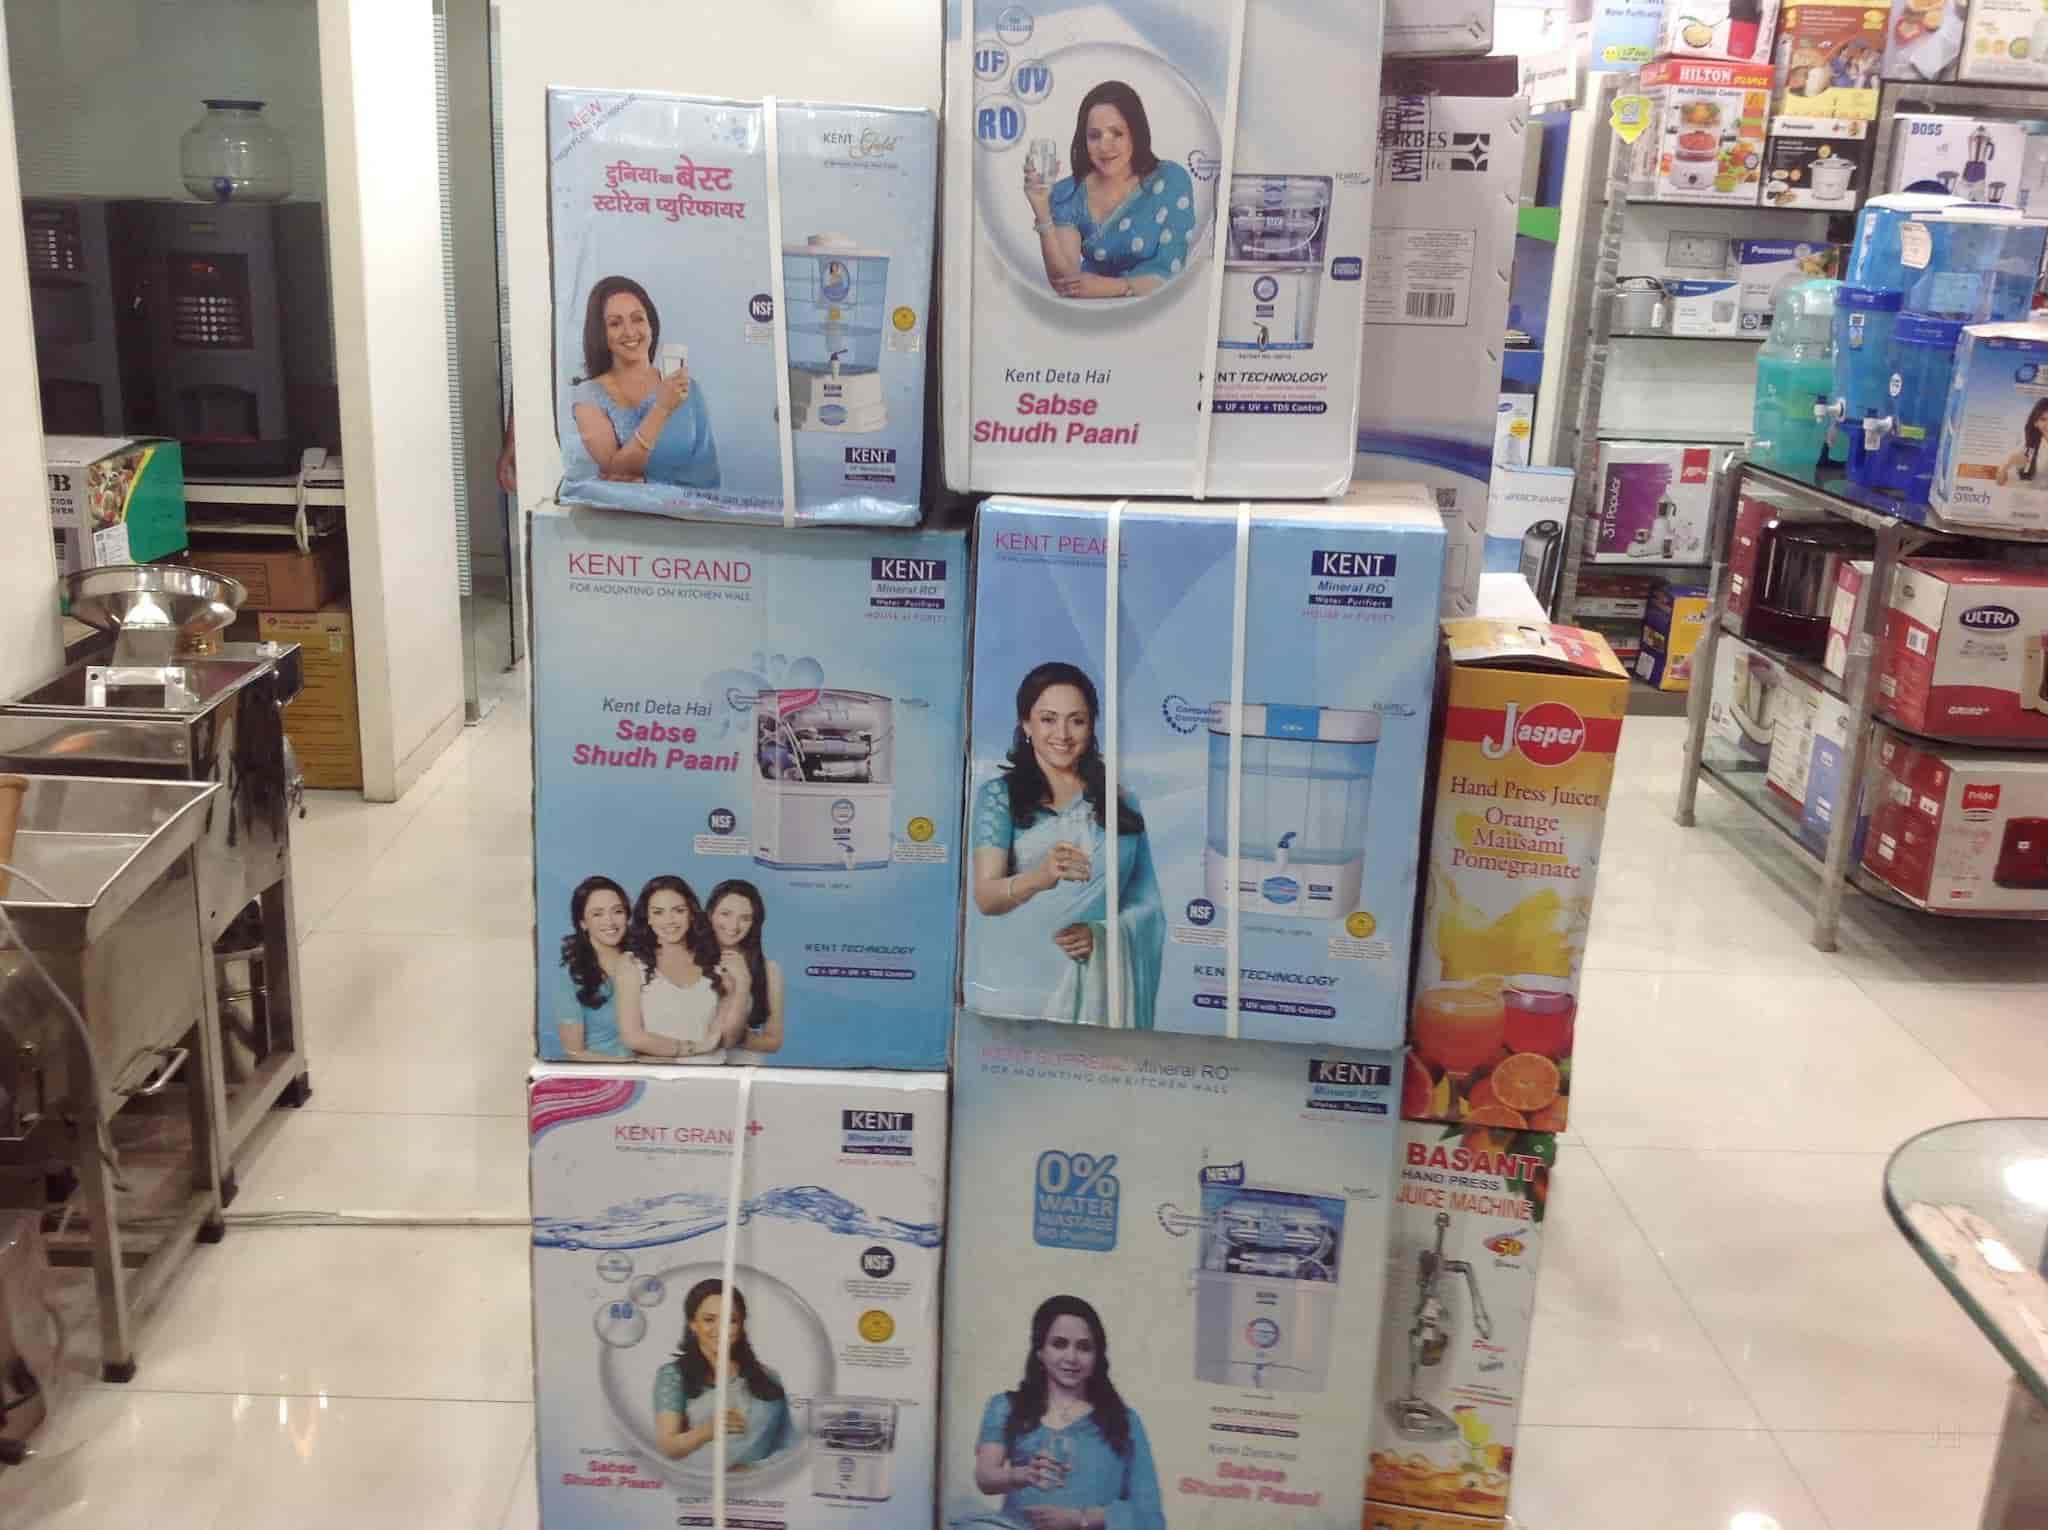 M S Pande & Sons, Sitabuldi - Mobile Phone Dealers in Nagpur - Justdial